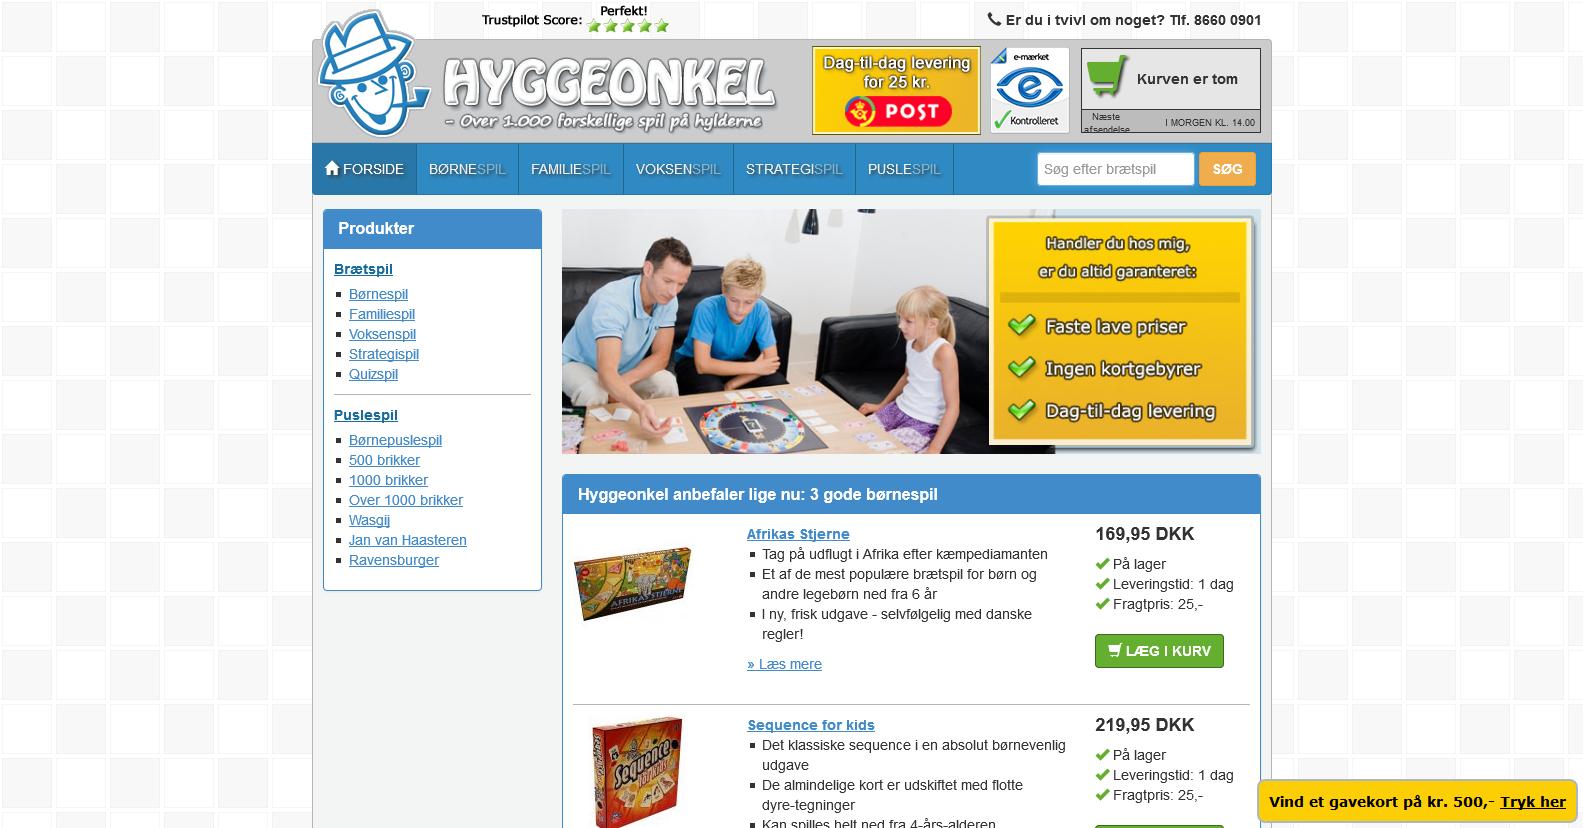 hyggeonkel.dk_2